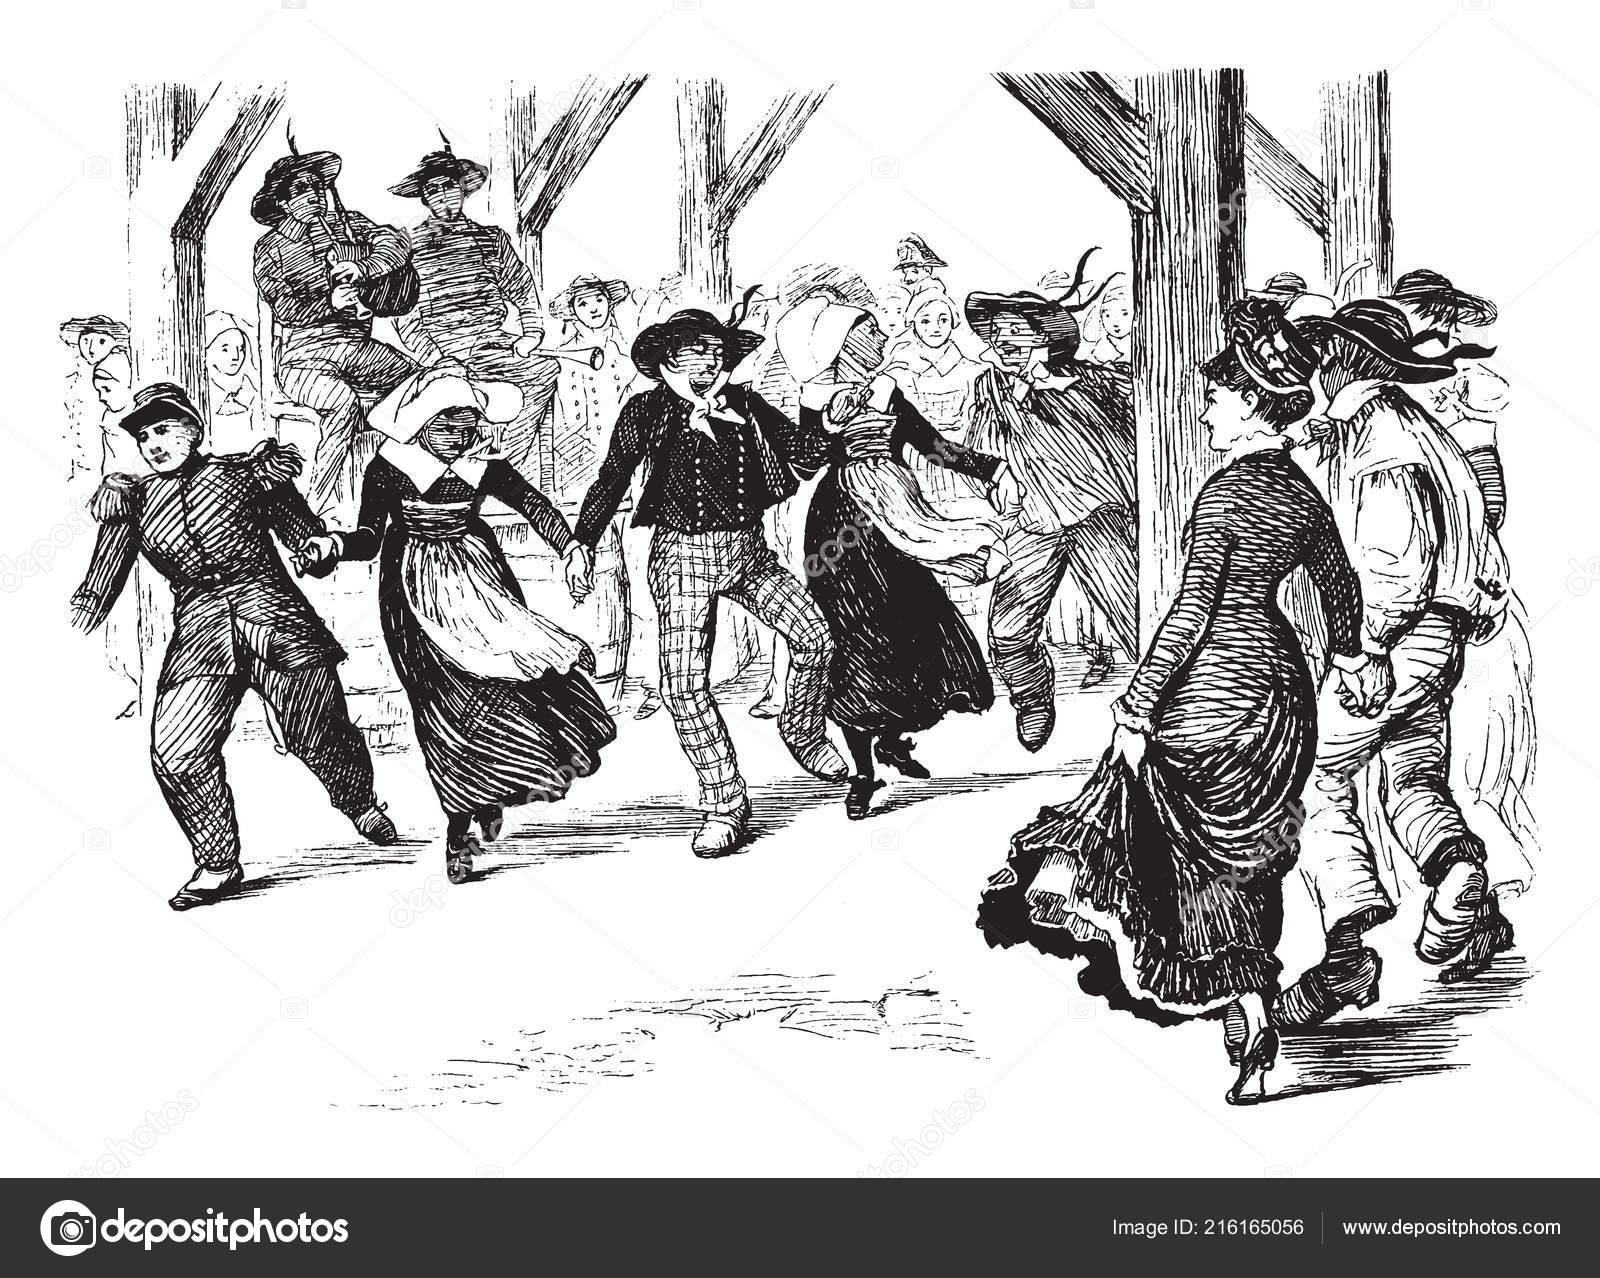 Group dancing men woman opposed individuals dancing alone